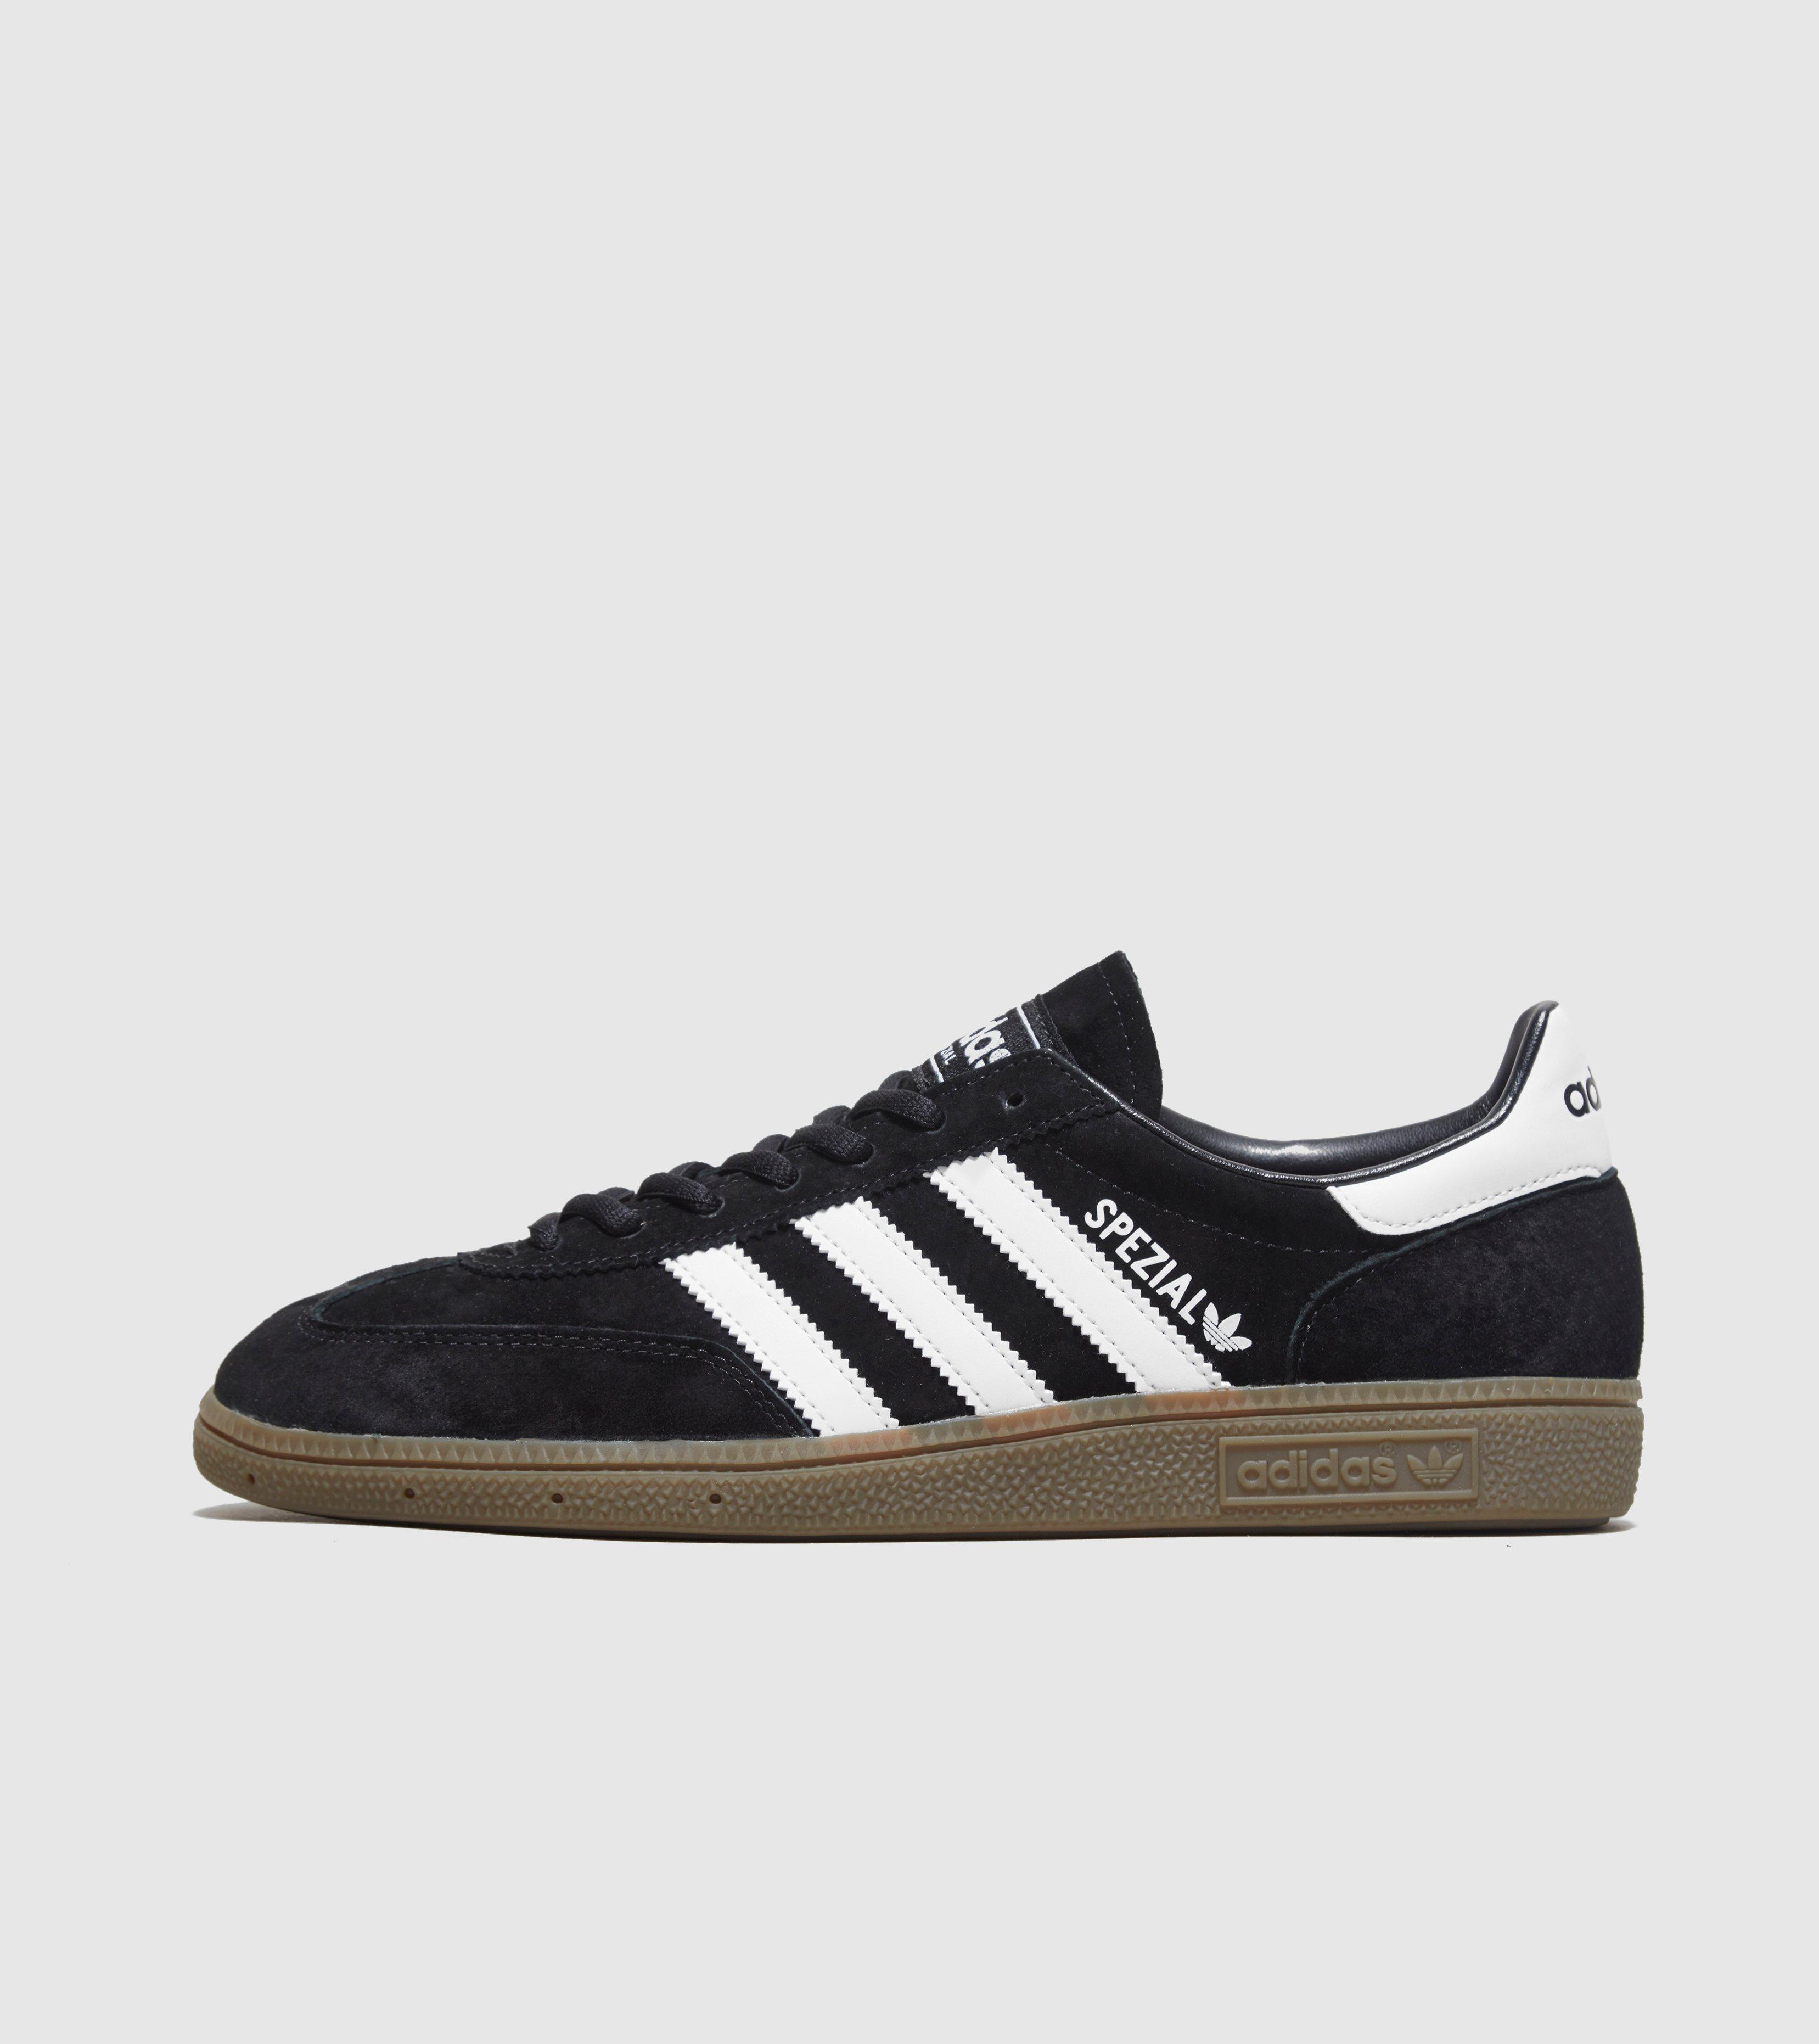 Adidas Spezial Shoes Grey Canada